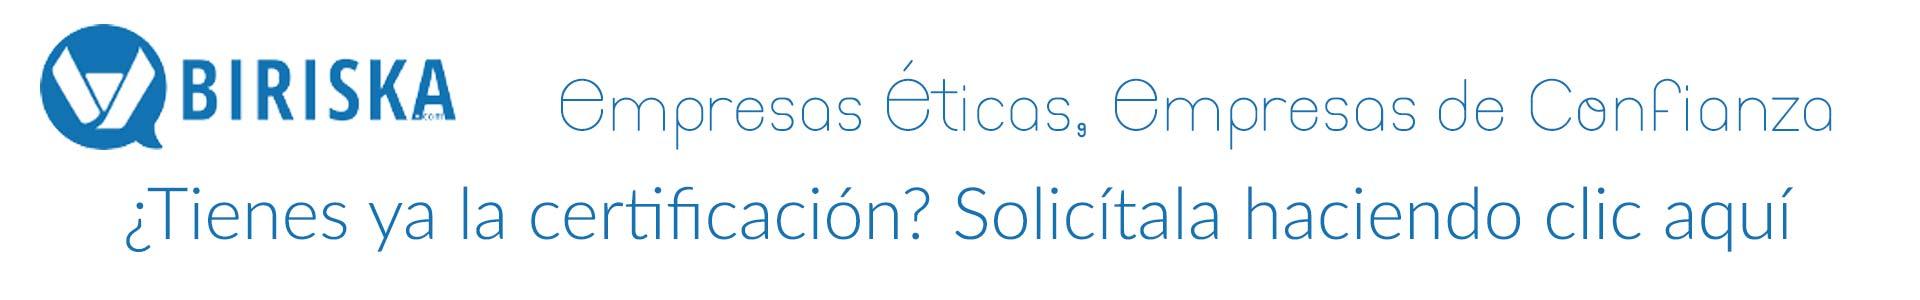 Biriska.com Solicita certificación